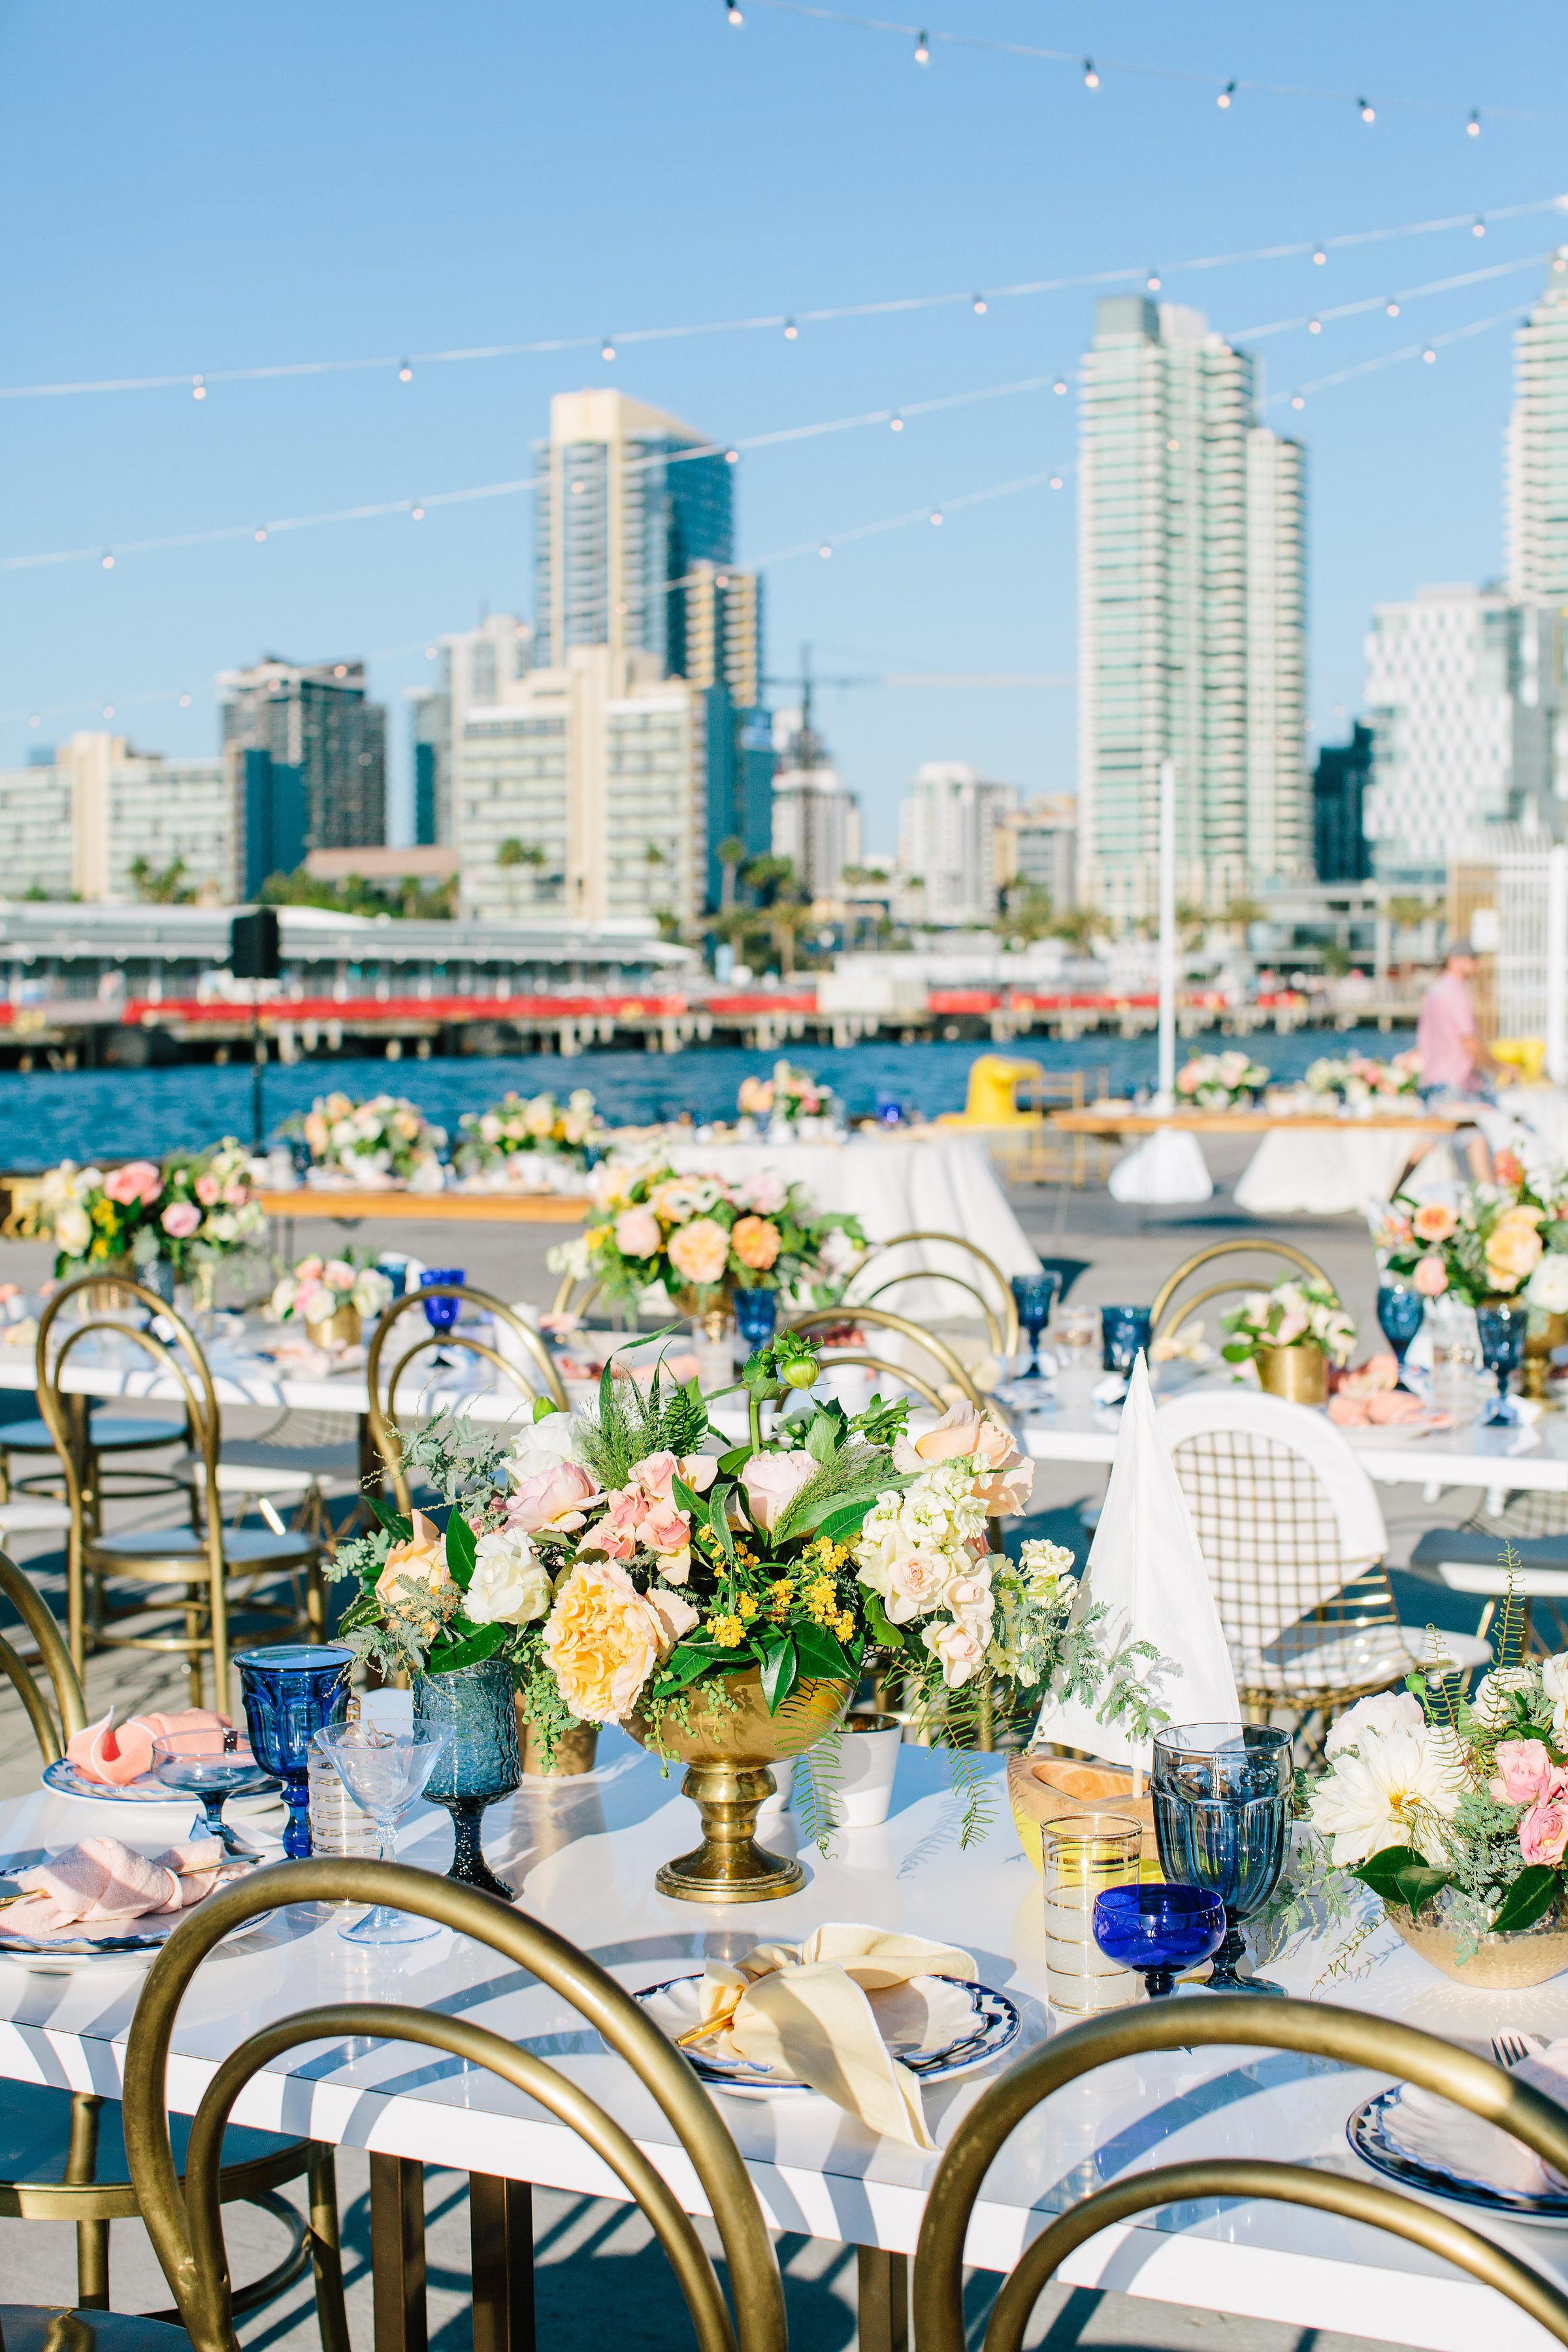 julie anthony real wedding centerpiece flowers city skyline